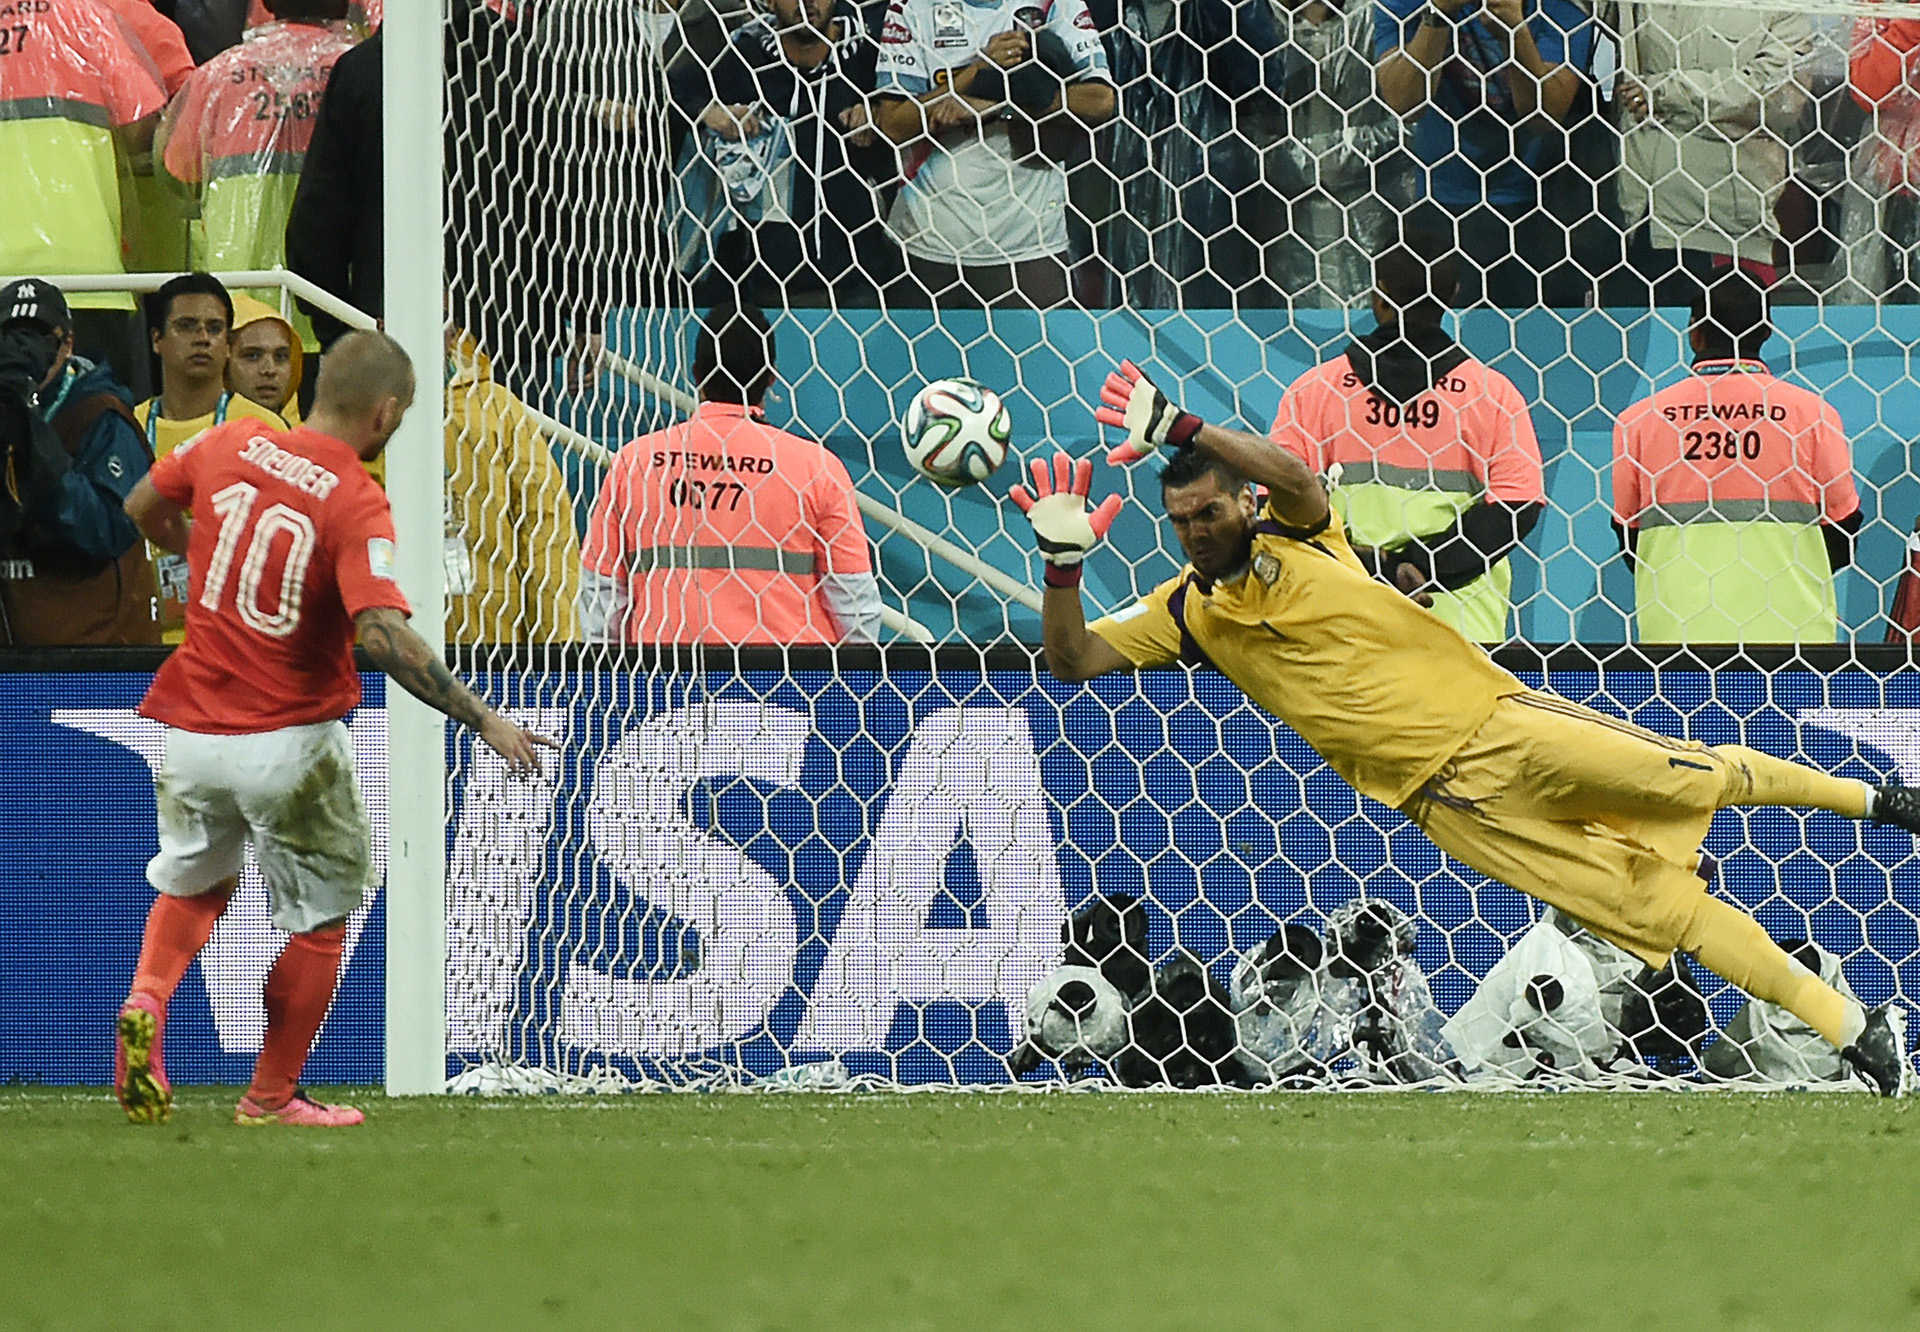 Sergio Romero Netherlands Argentina 2014 World Cup semi-final 07092014